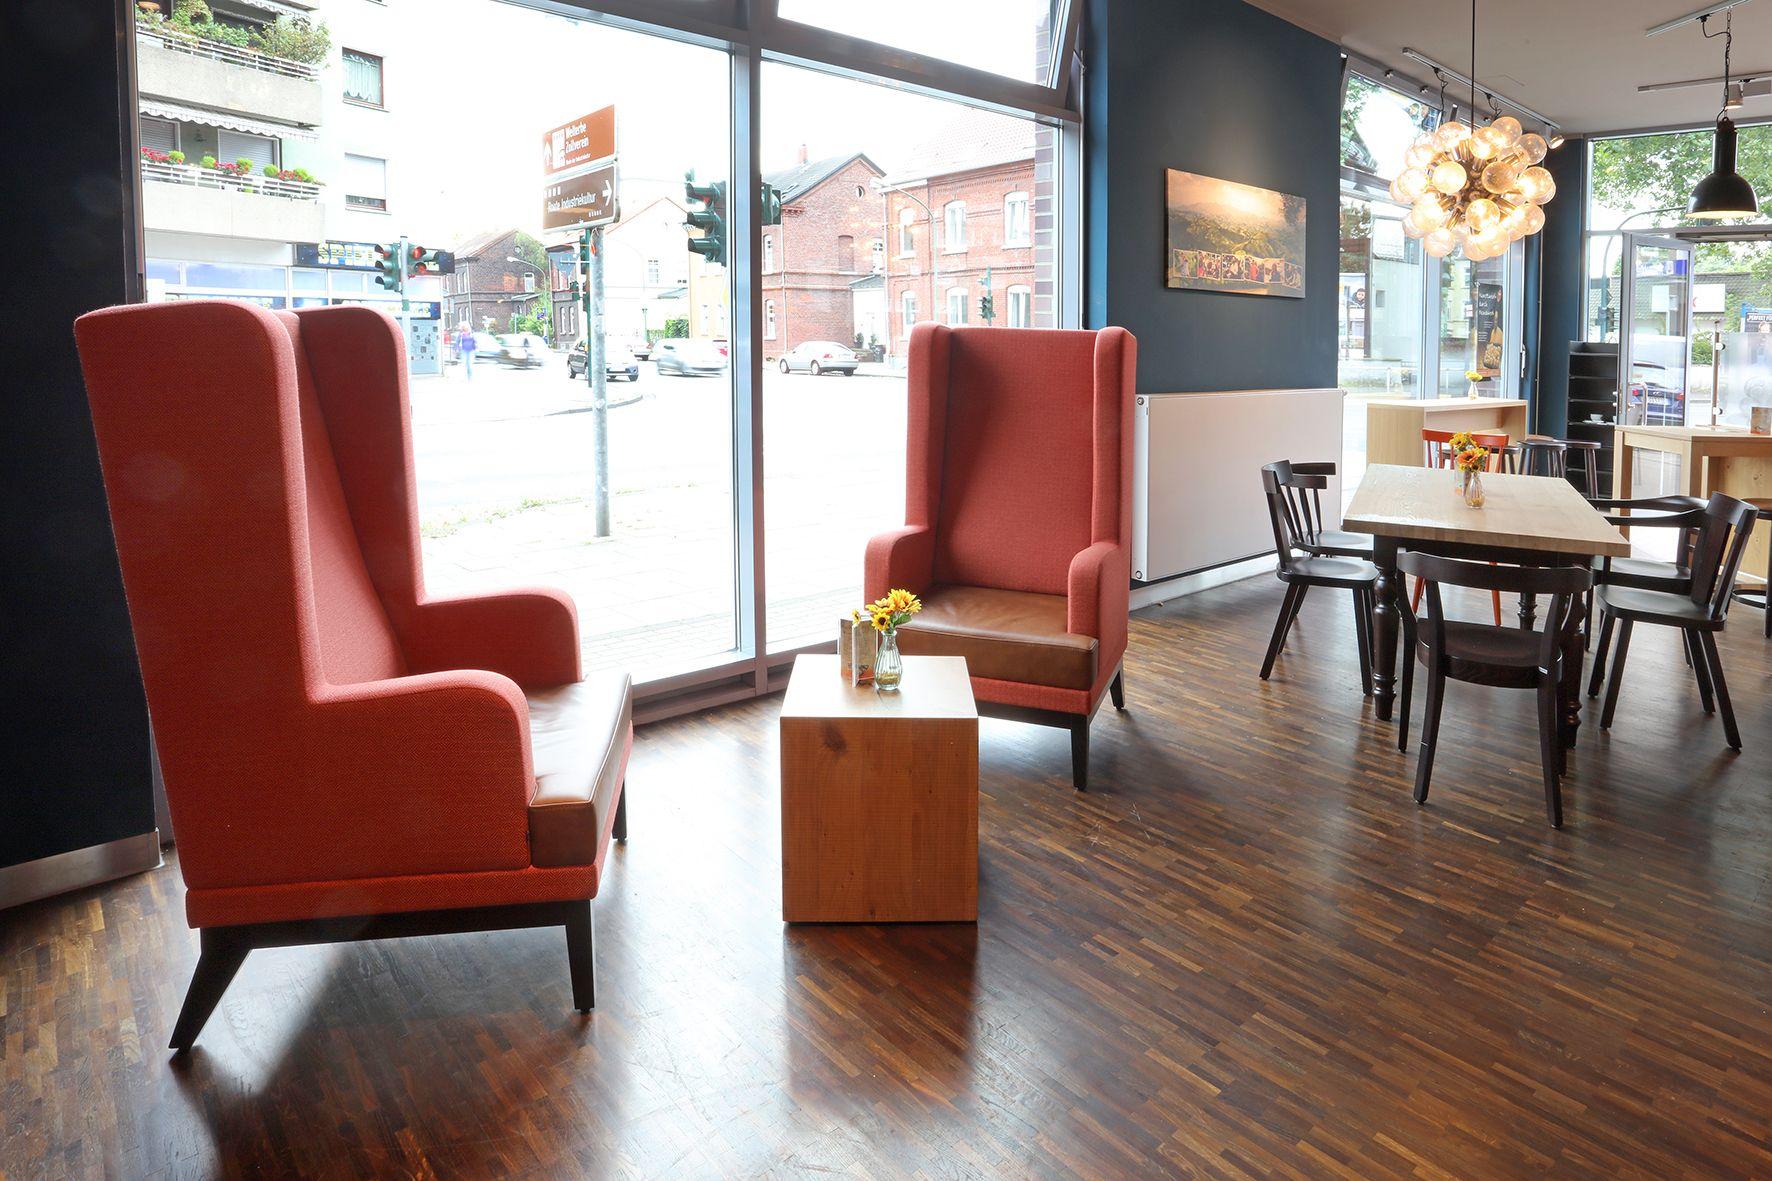 html cafe essen gastronomie mobel bestuhlung lounge mobel ladenbau coffee shops